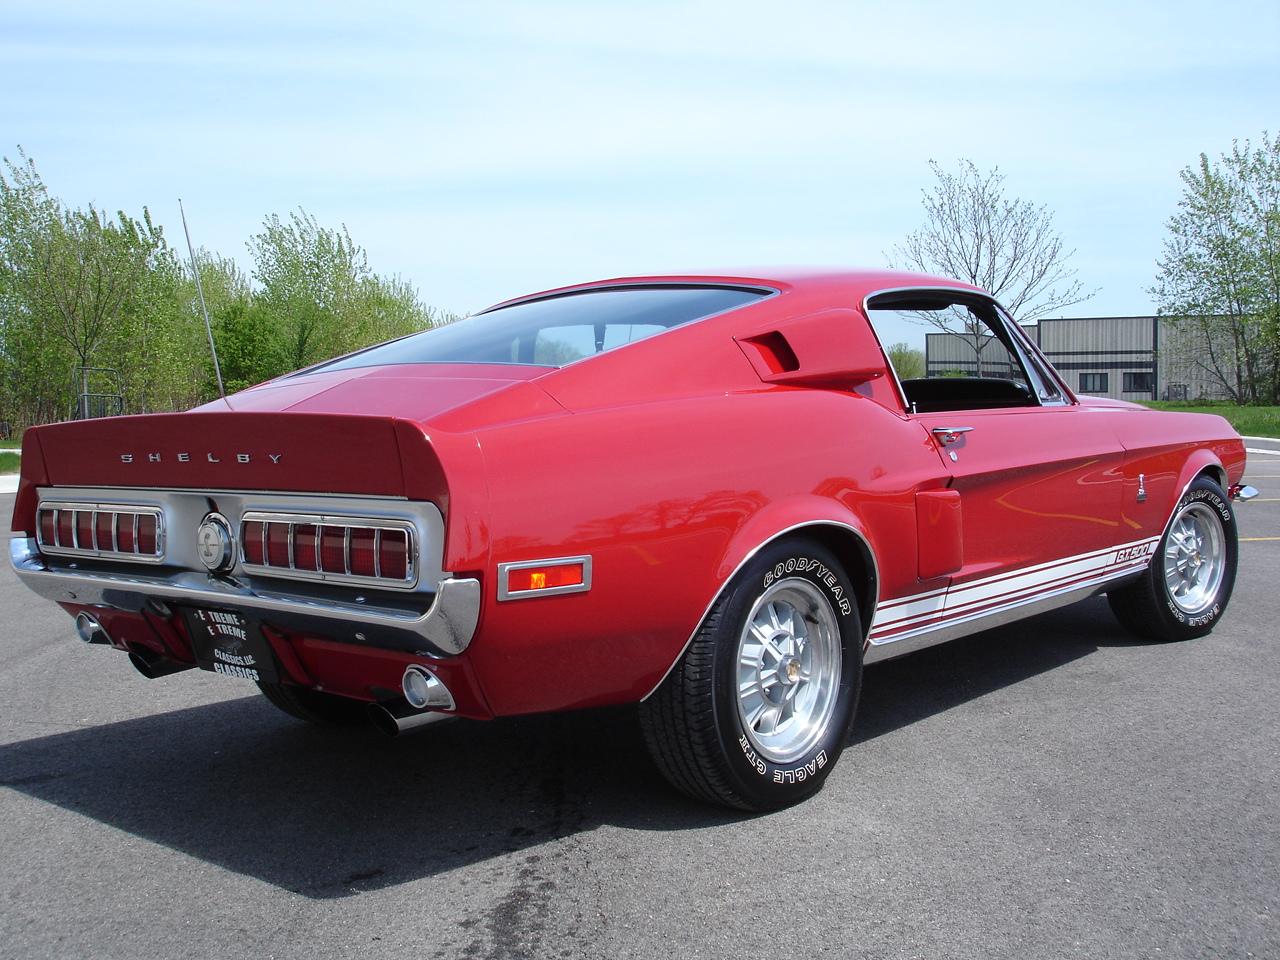 /1968-mustang-shelby-gt500-dark-red